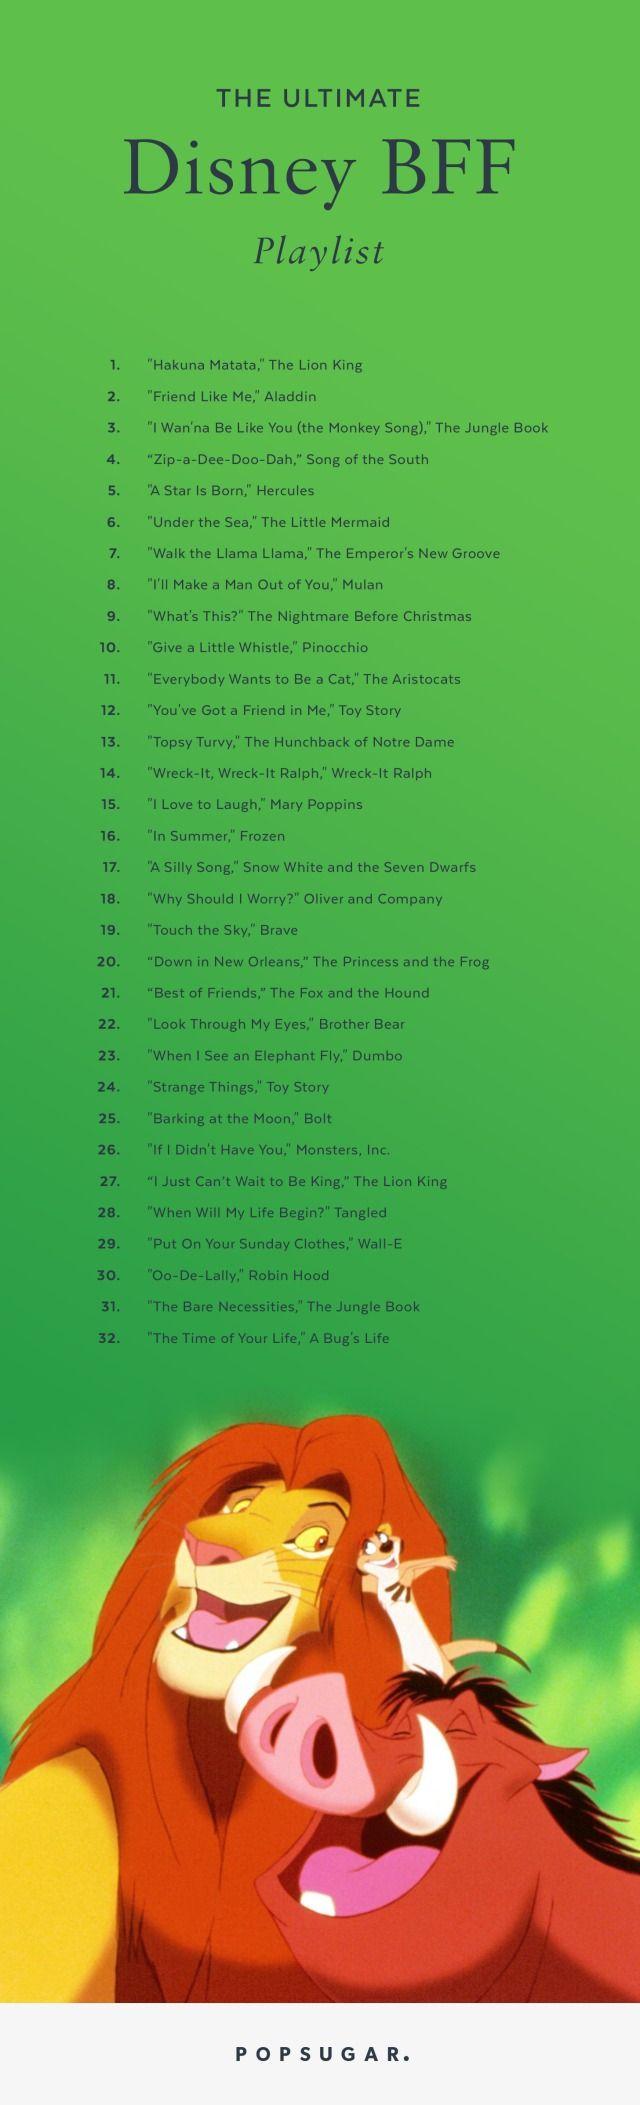 the ultimate disney bff playlist   disney princesses in pop culture